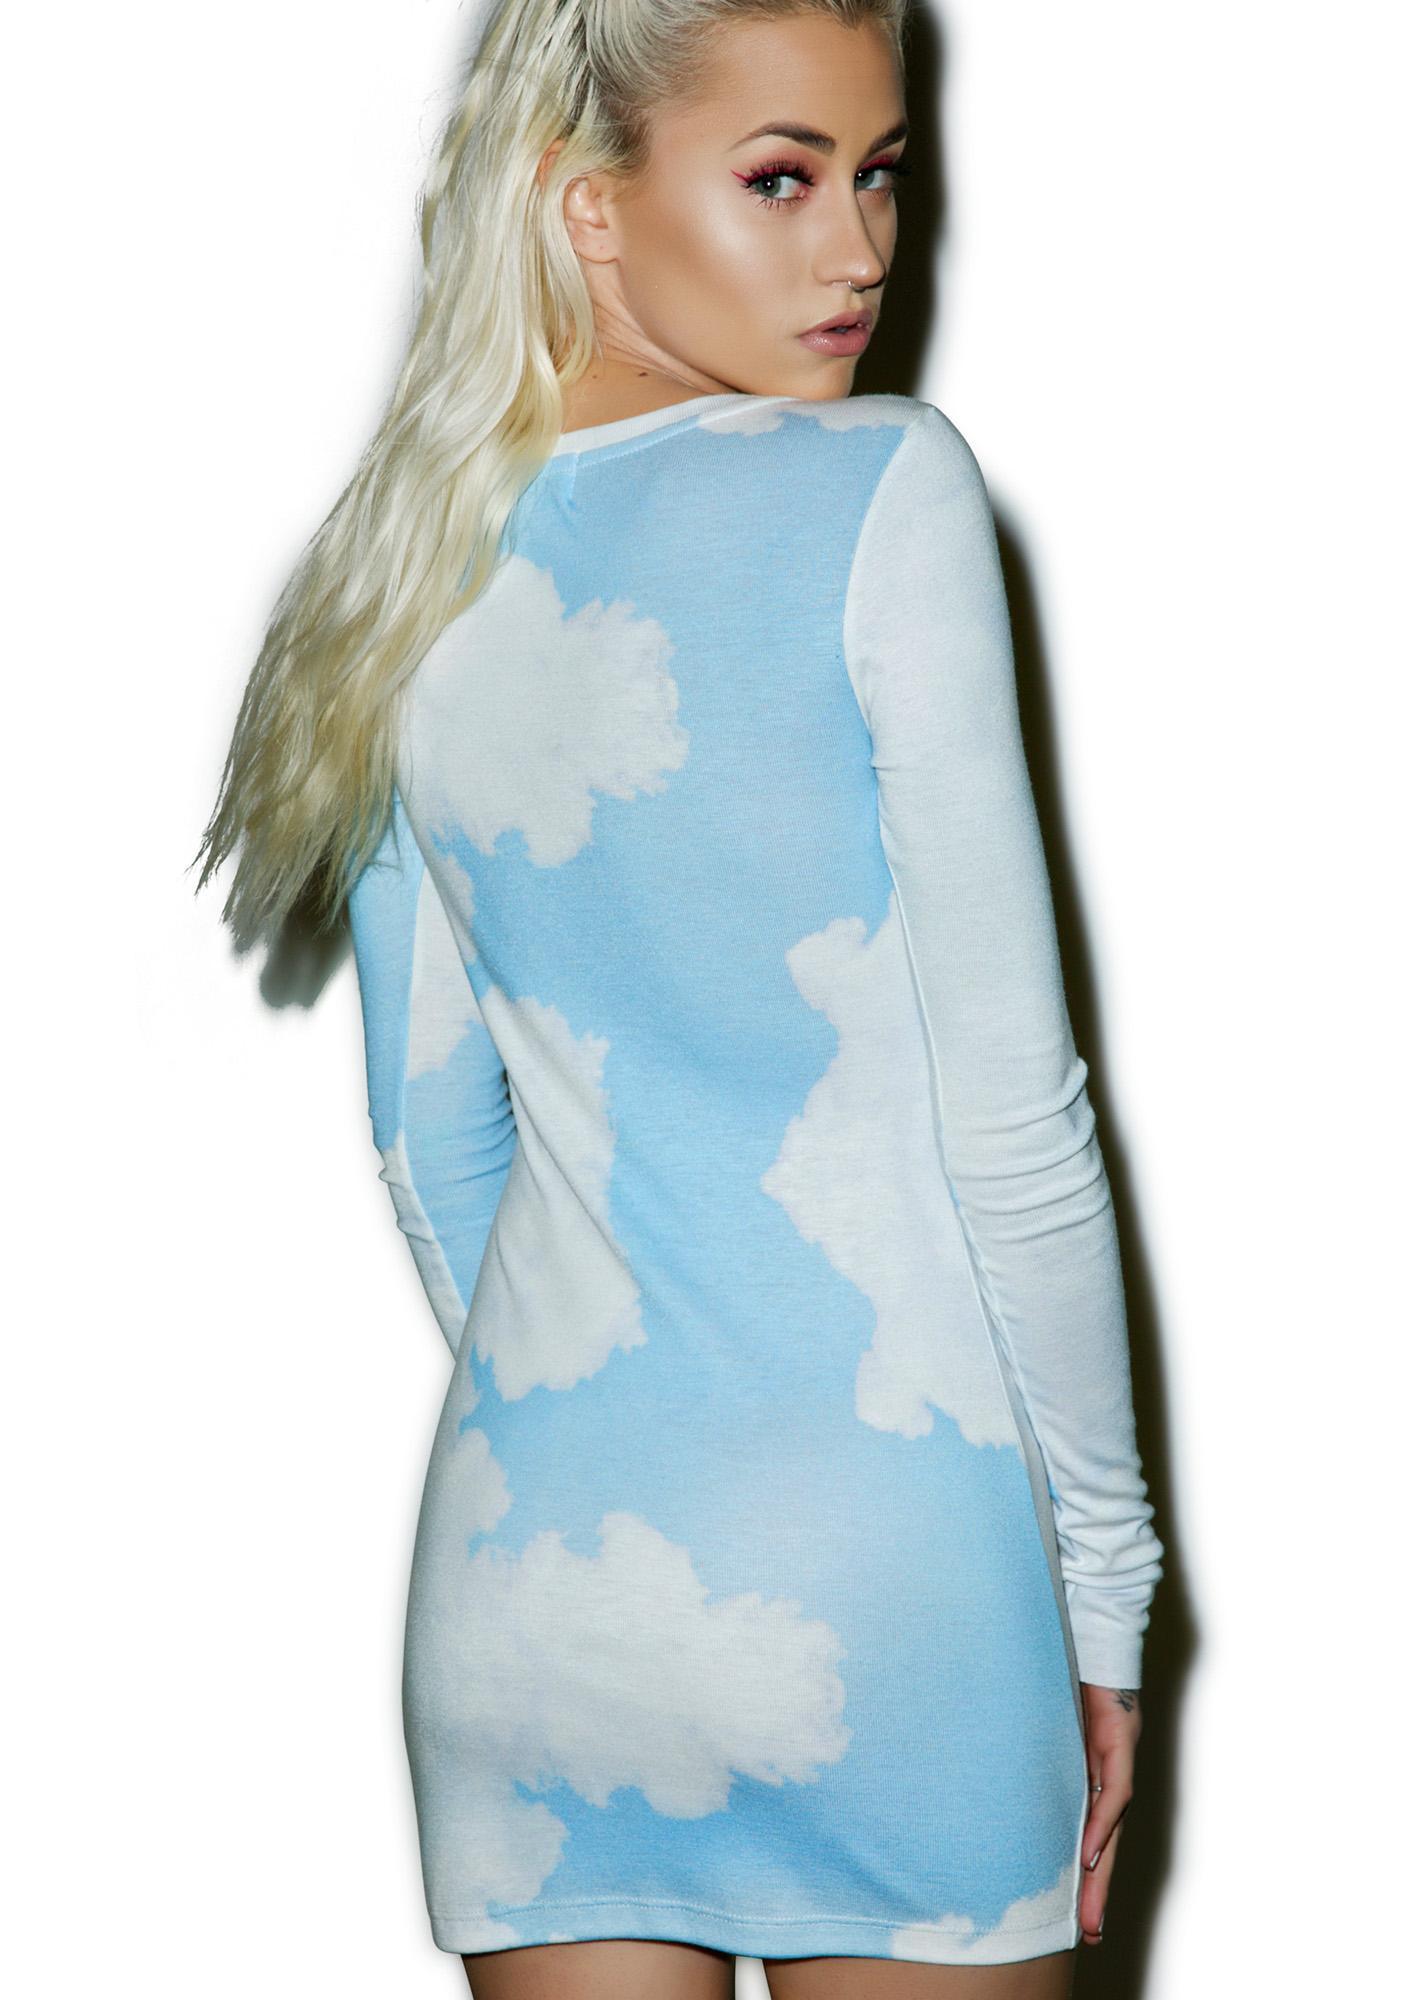 Wildfox Couture Stairway To Heaven Arizona Dress